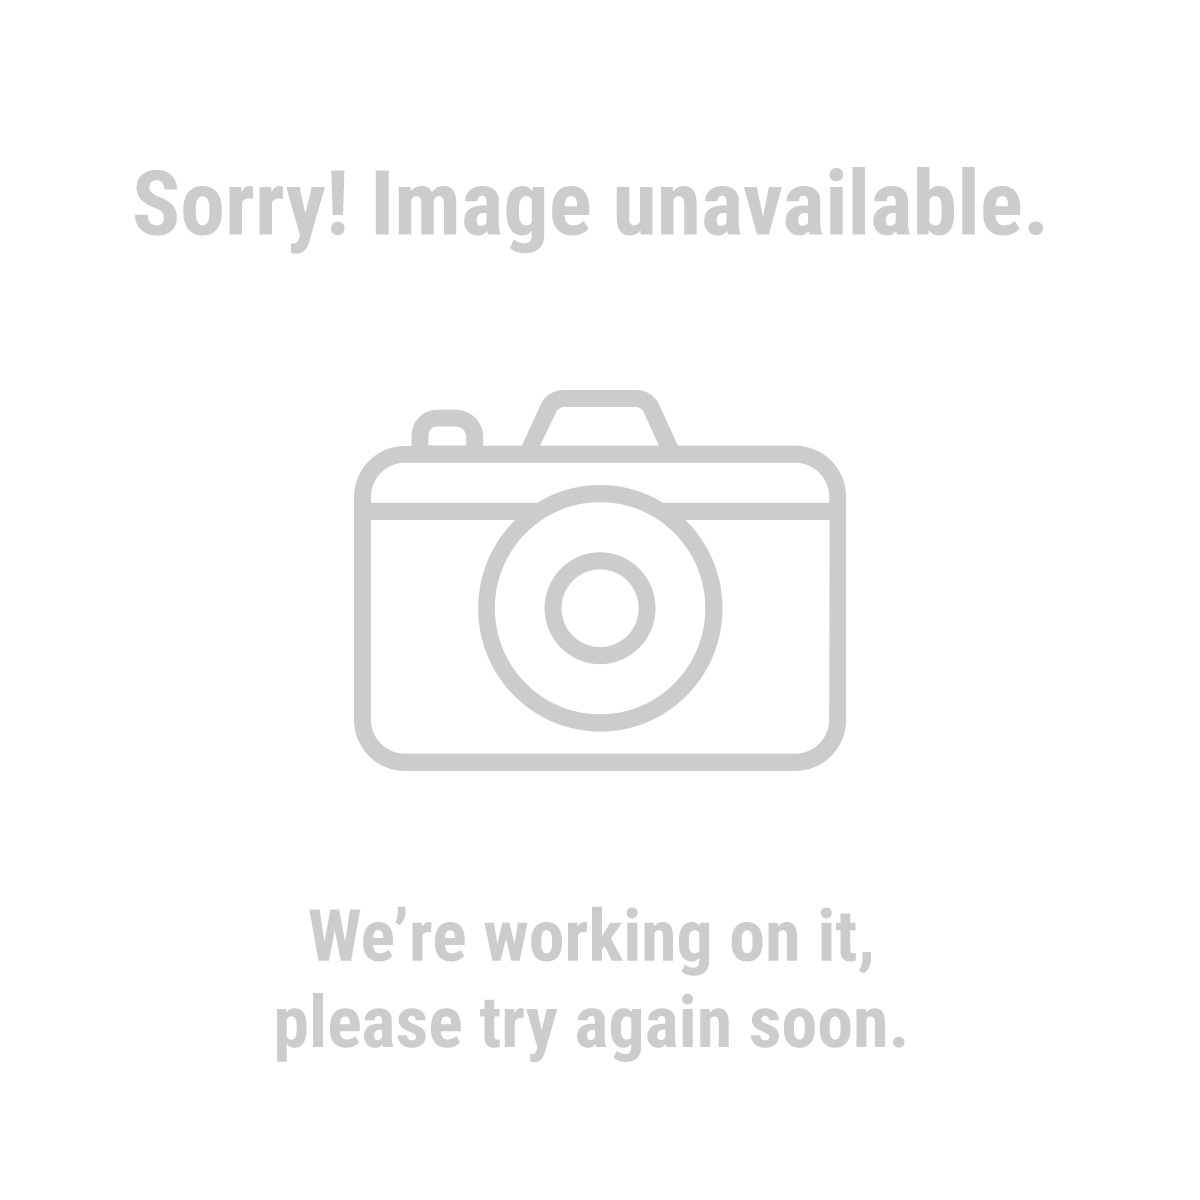 Predator Engines 61415 8 HP (301cc) OHV Horizontal Shaft Gas Engine